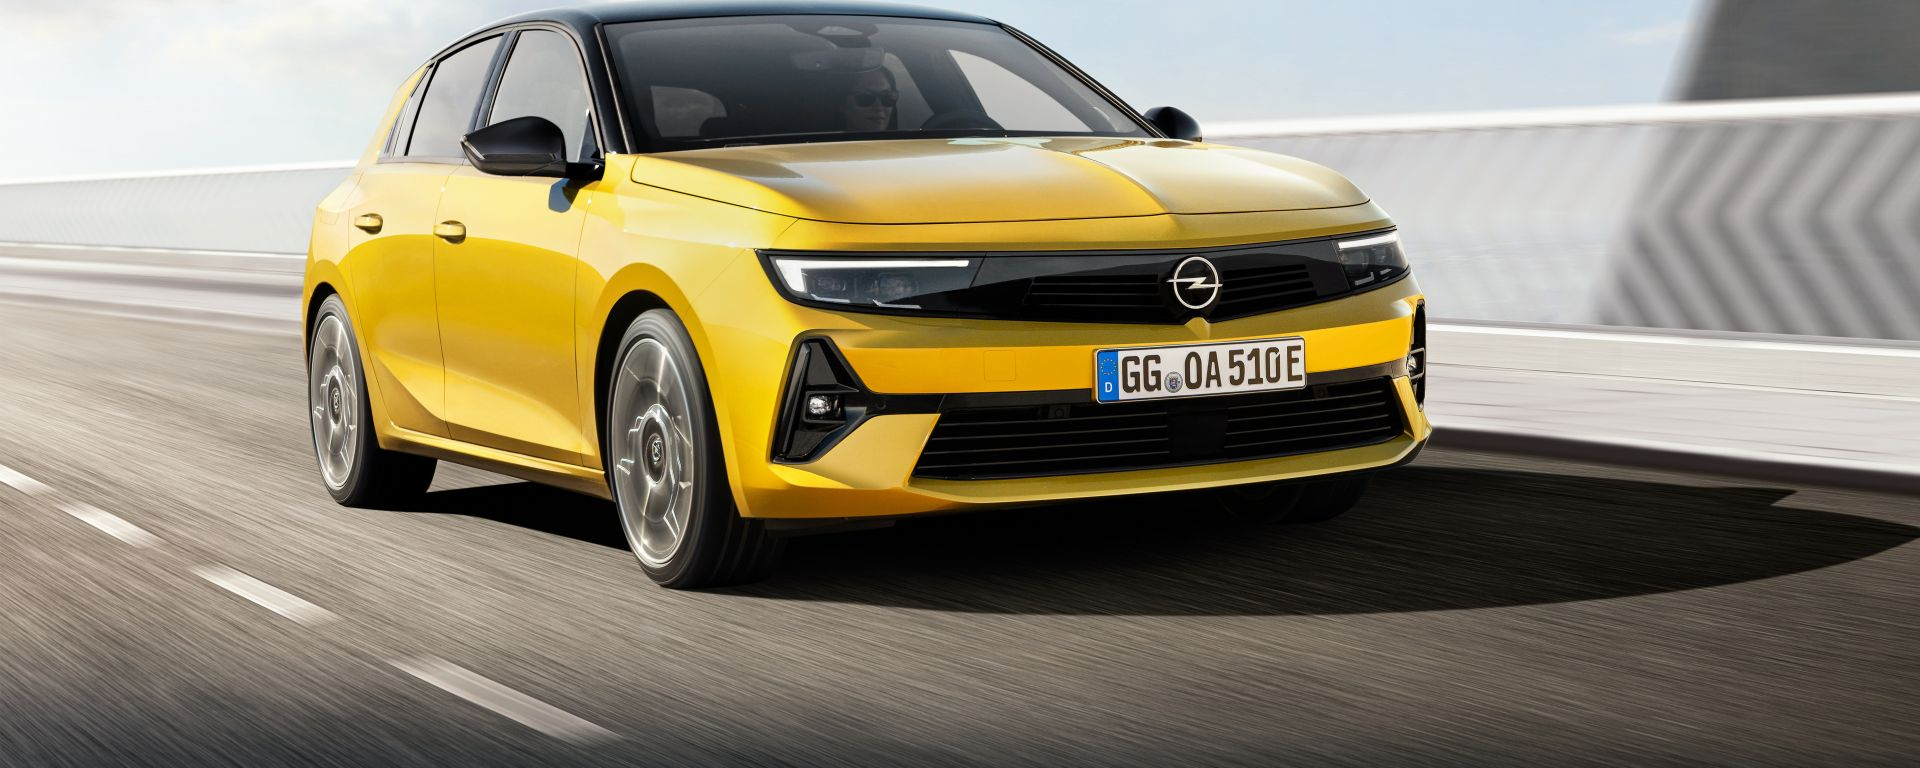 Opel Astra 2021, fotogallery